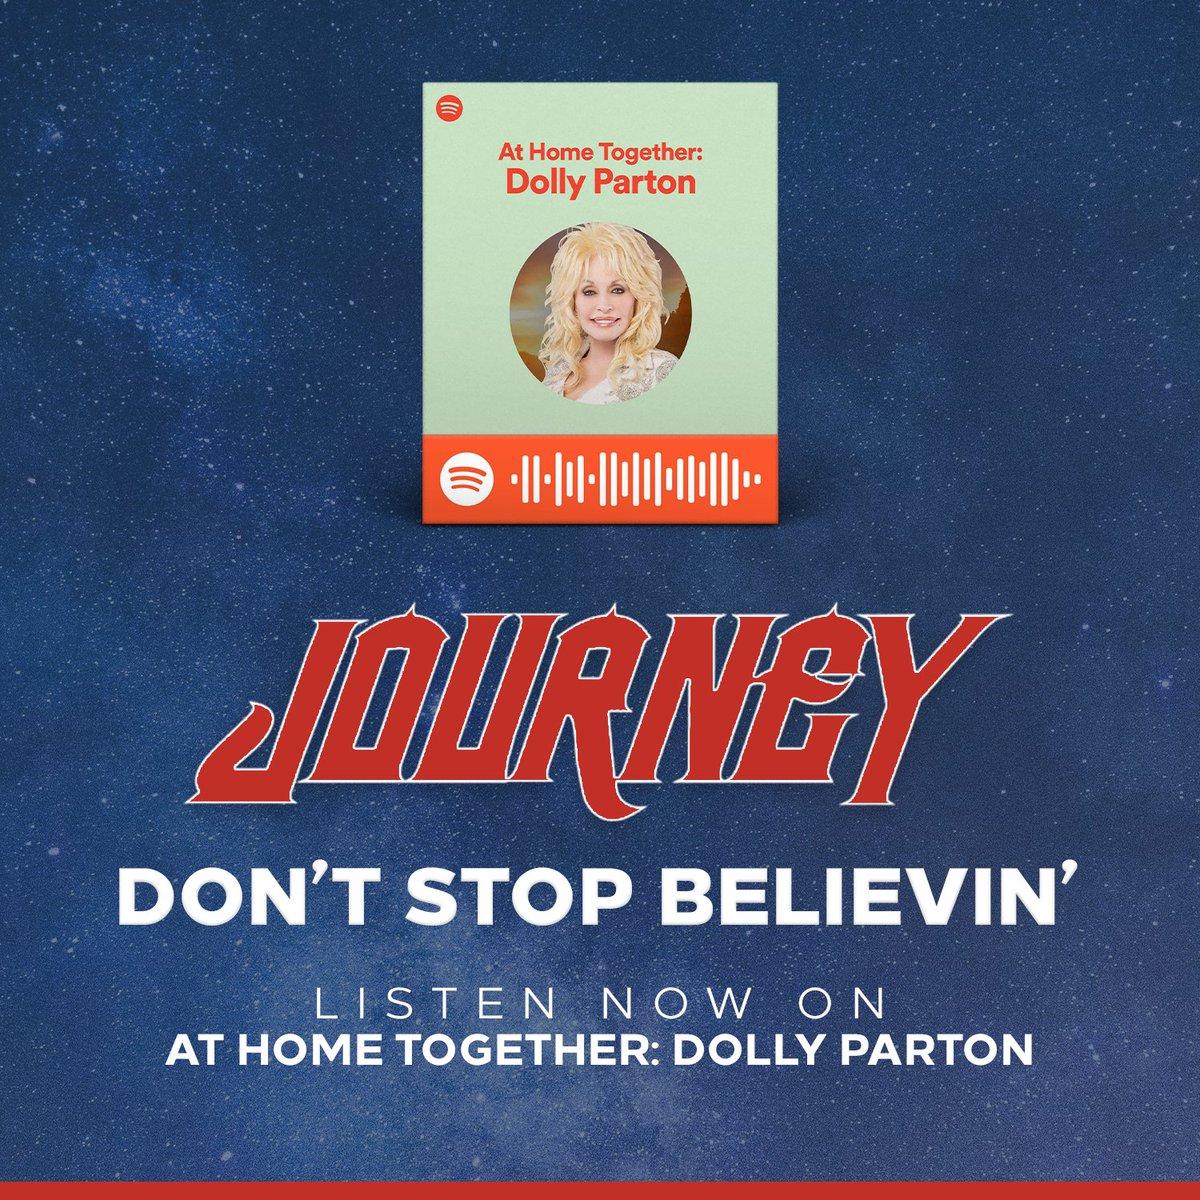 Big thx to @DollyParton & @selenagomez for adding #DontStopBelievin to their #TogetherPlaylists on @Spotify!   https:// bit.ly/JourneyAtHomeT ogether  …    https:// bit.ly/JourneyCooking Together  … <br>http://pic.twitter.com/xTVdFC5xAC